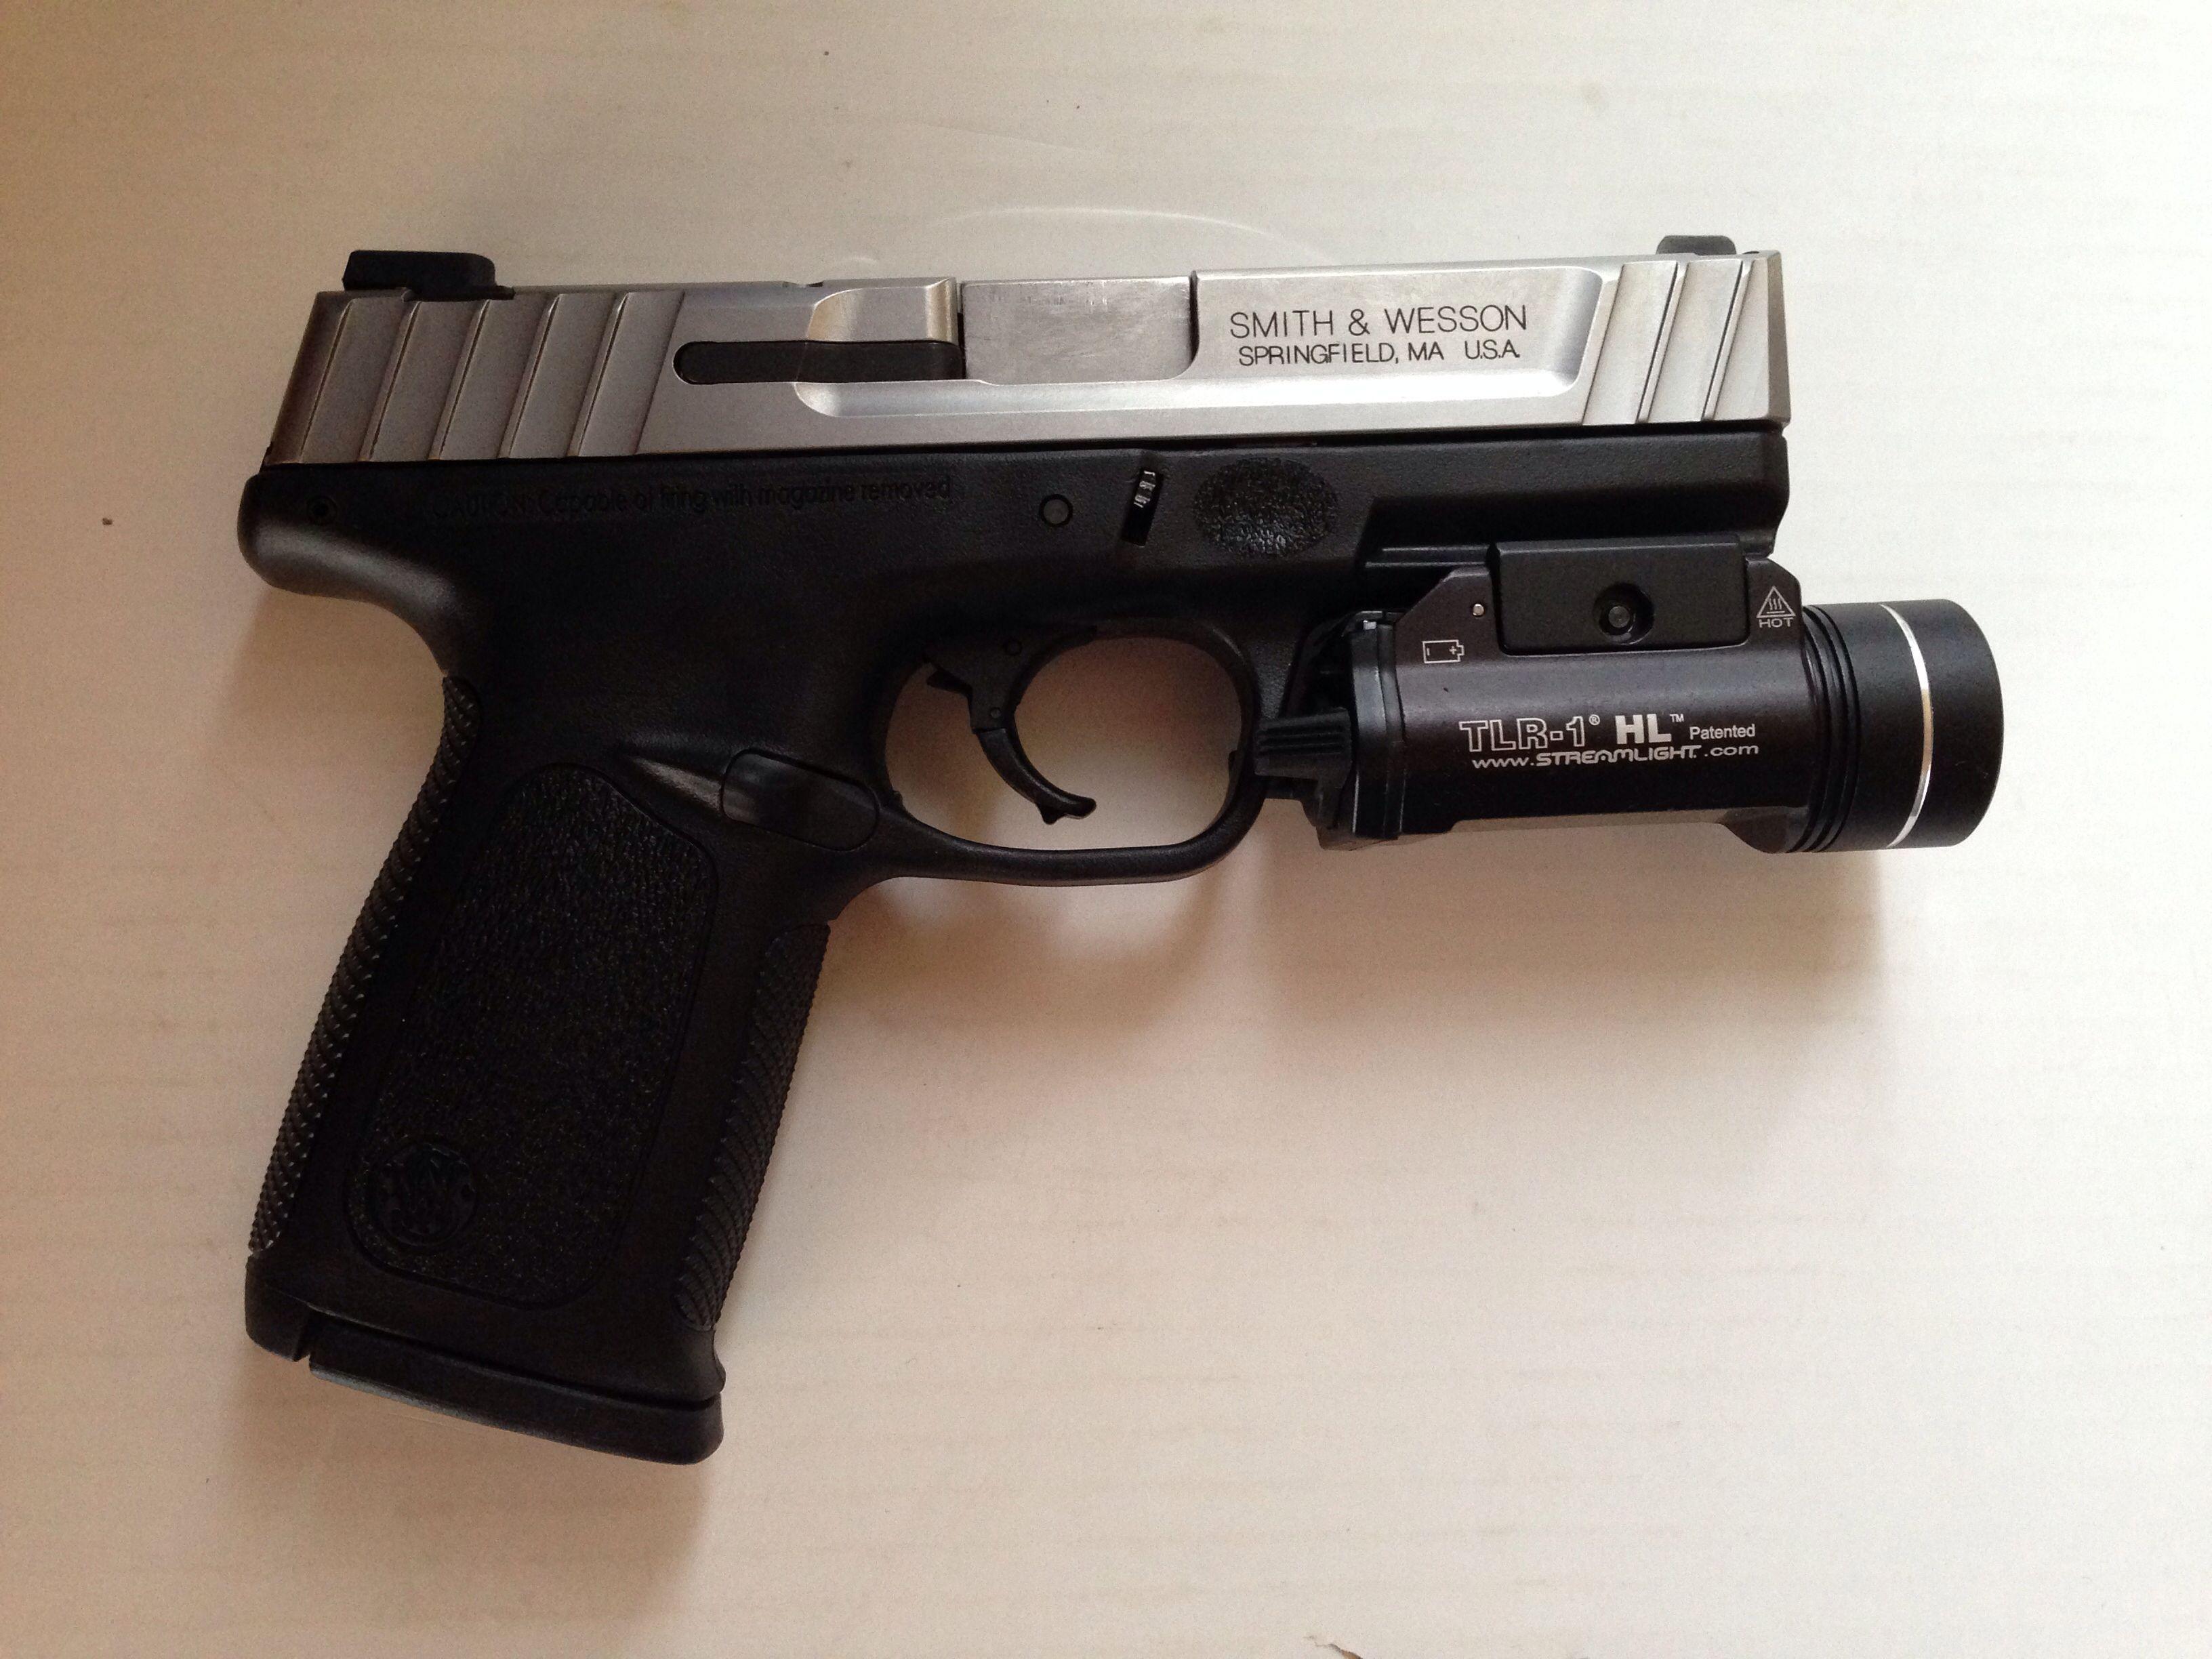 Smith & Wesson SD40 VE Streamlight TLR-1 HL   Random